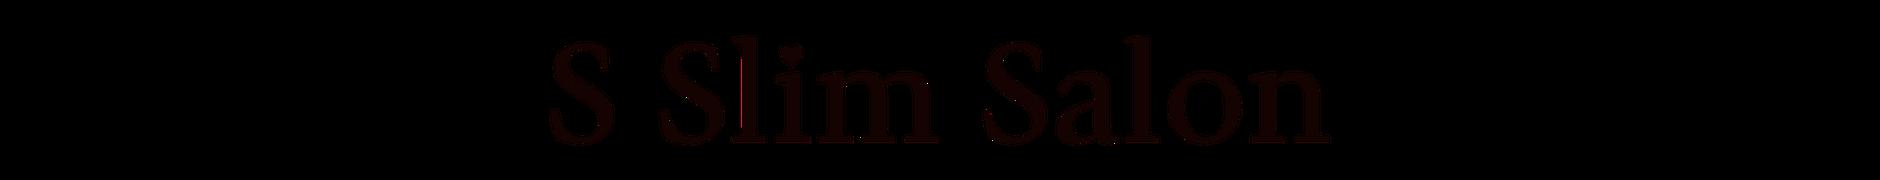 S Slim Salon オンラインショップ